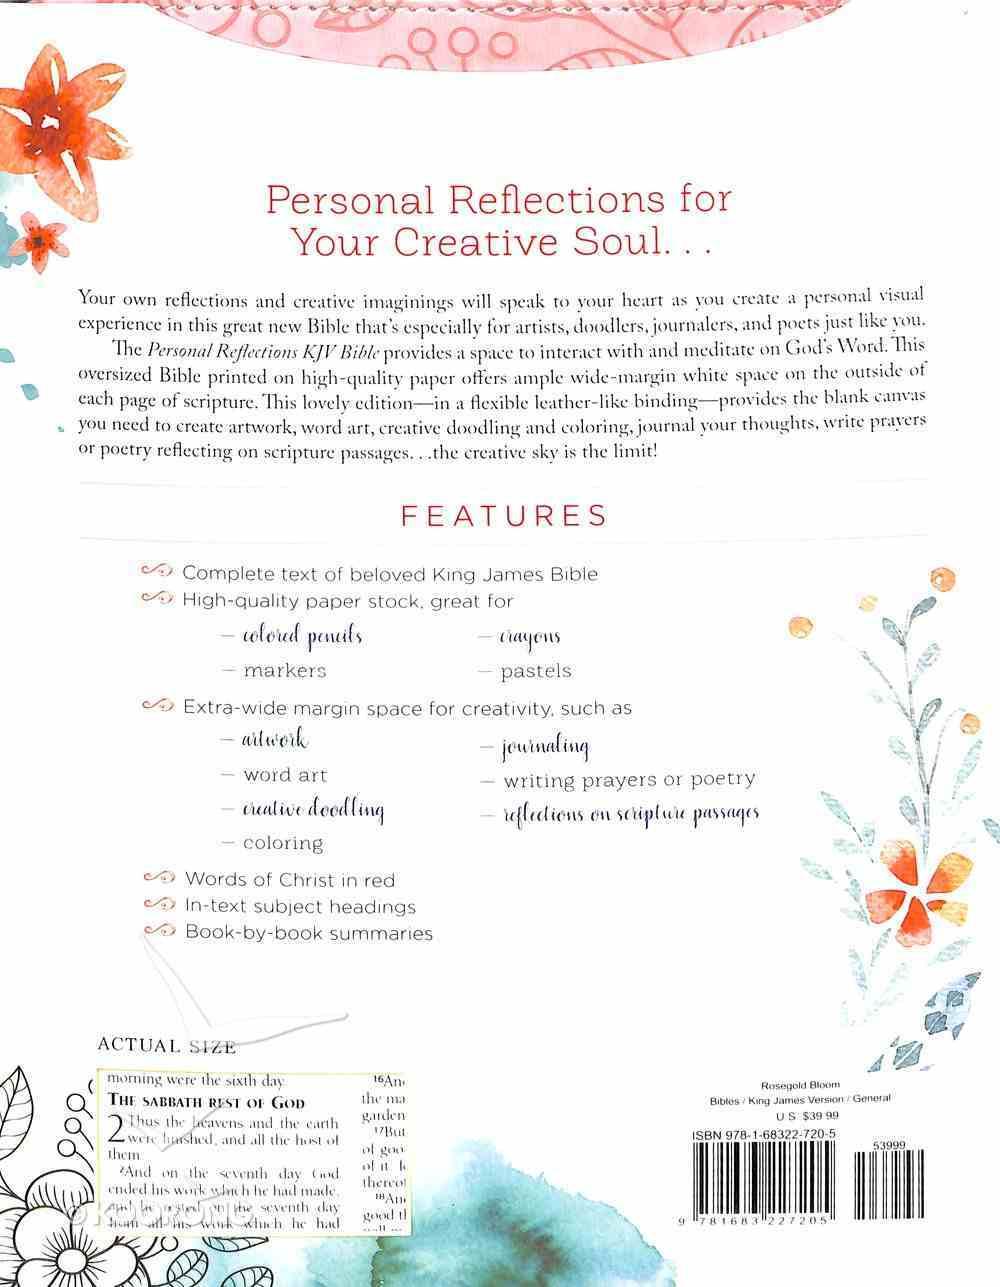 KJV Personal Reflections Bible Rosegold Bloom Imitation Leather